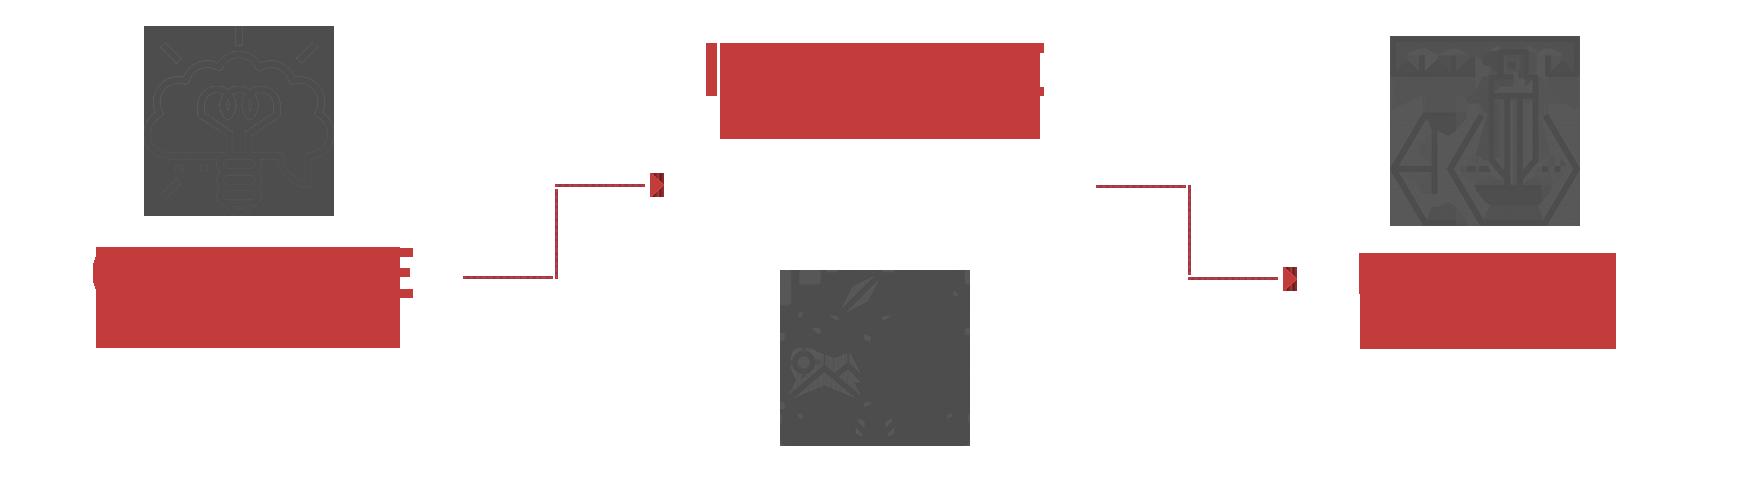 design branding feature overview